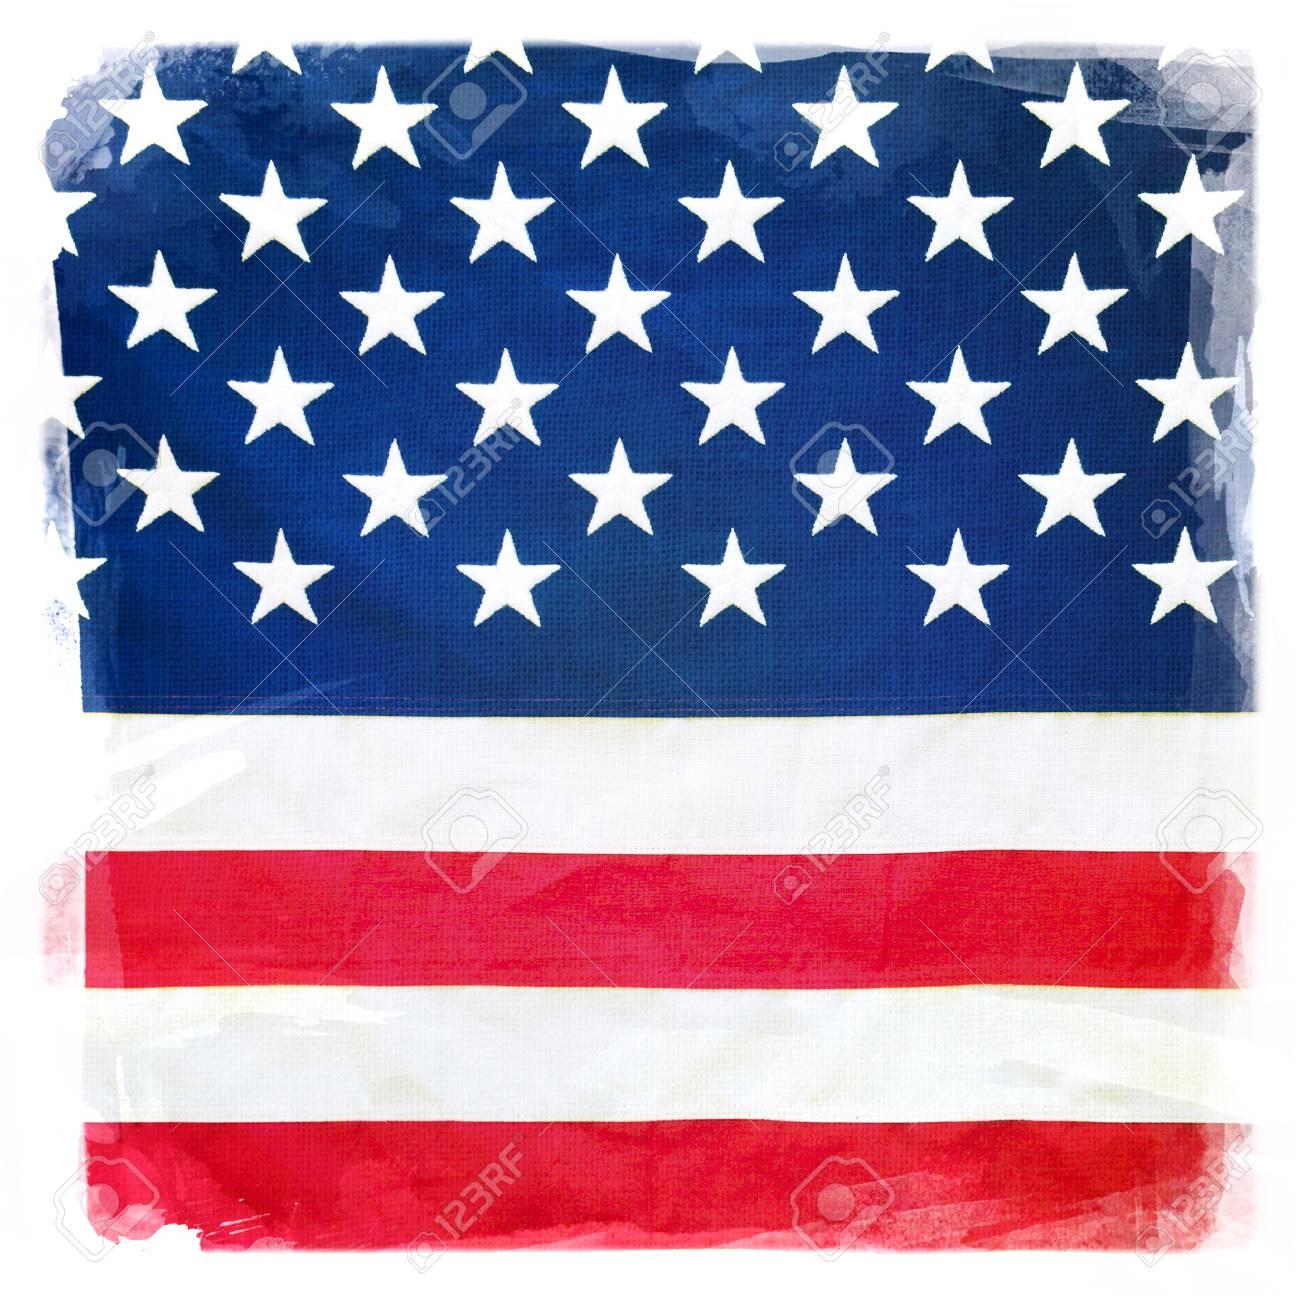 5e7737f6b10c Closeup of stars and stripes of American flag Stock Photo - 29965457